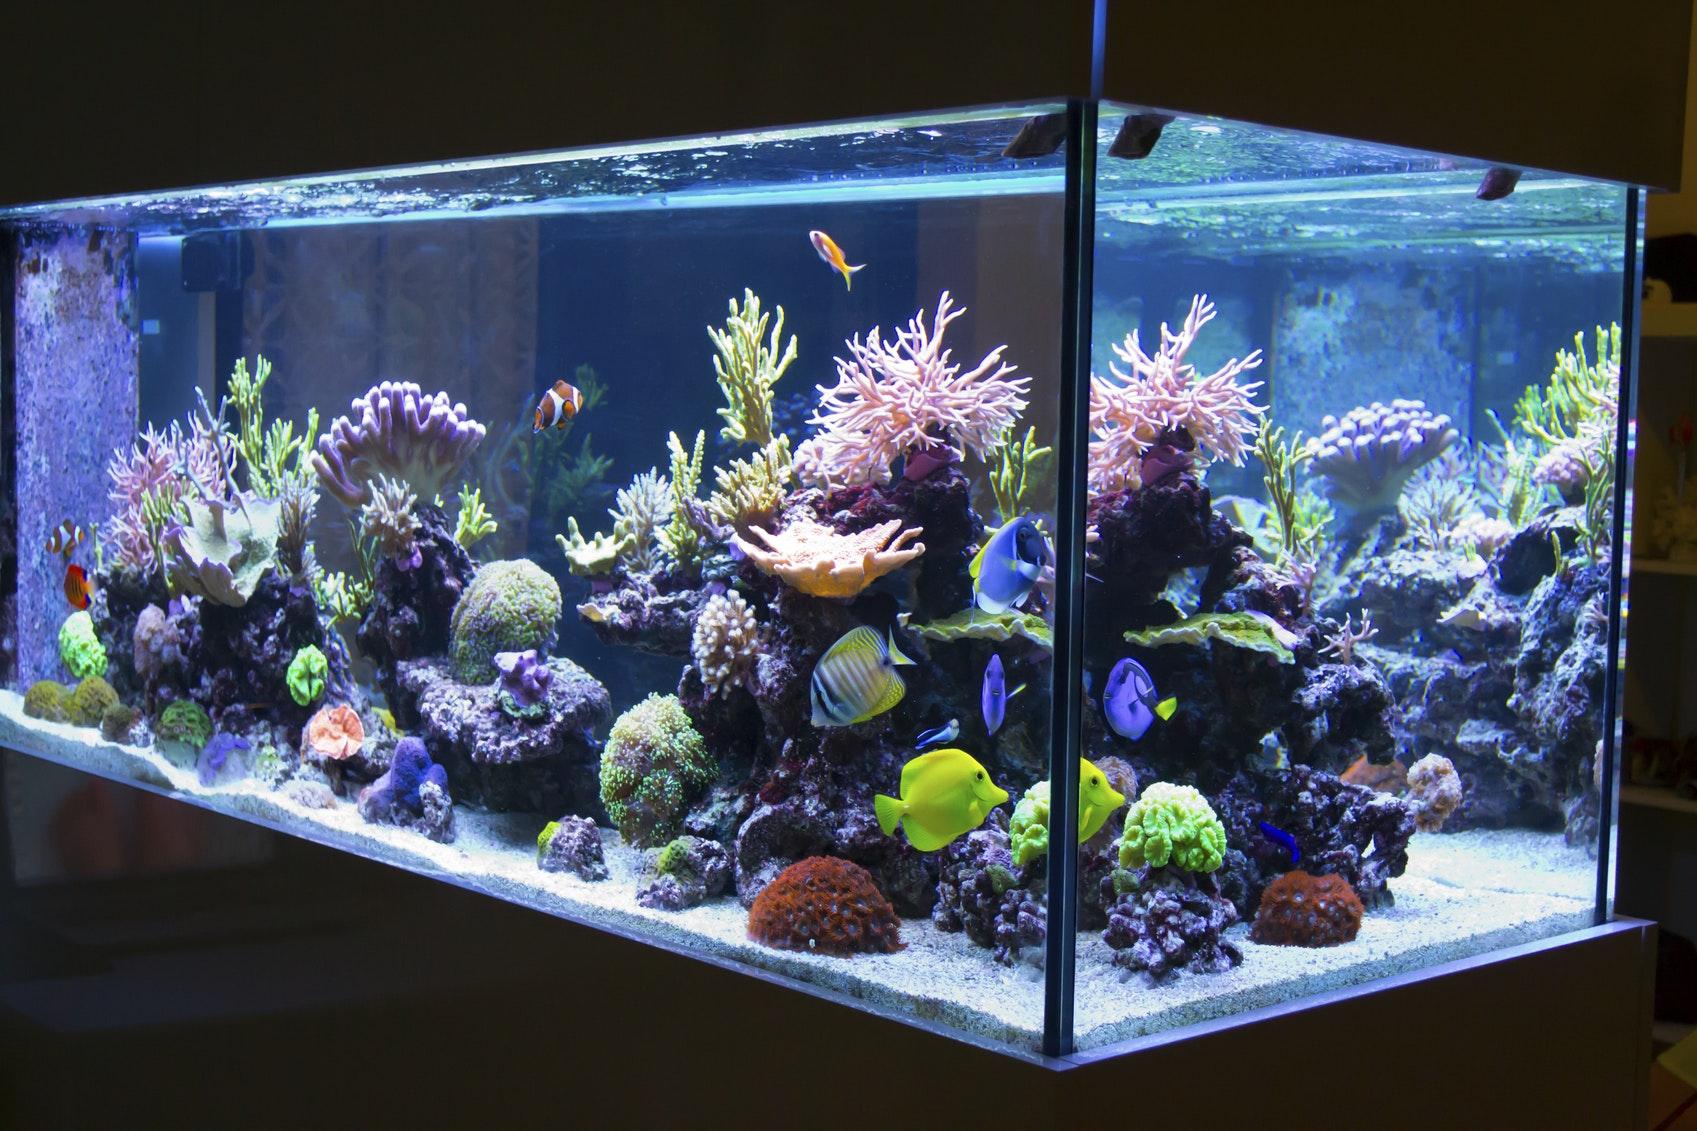 aquarium cleaning set sweepstakes